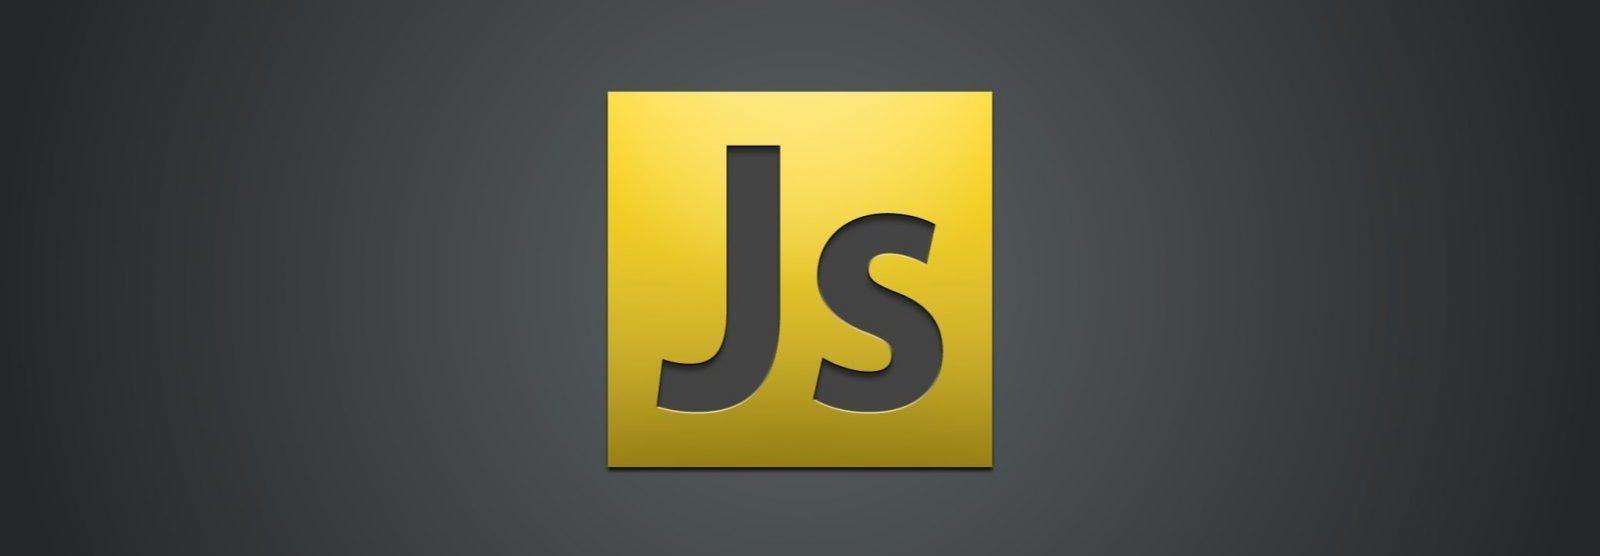 javascript-wallpaper